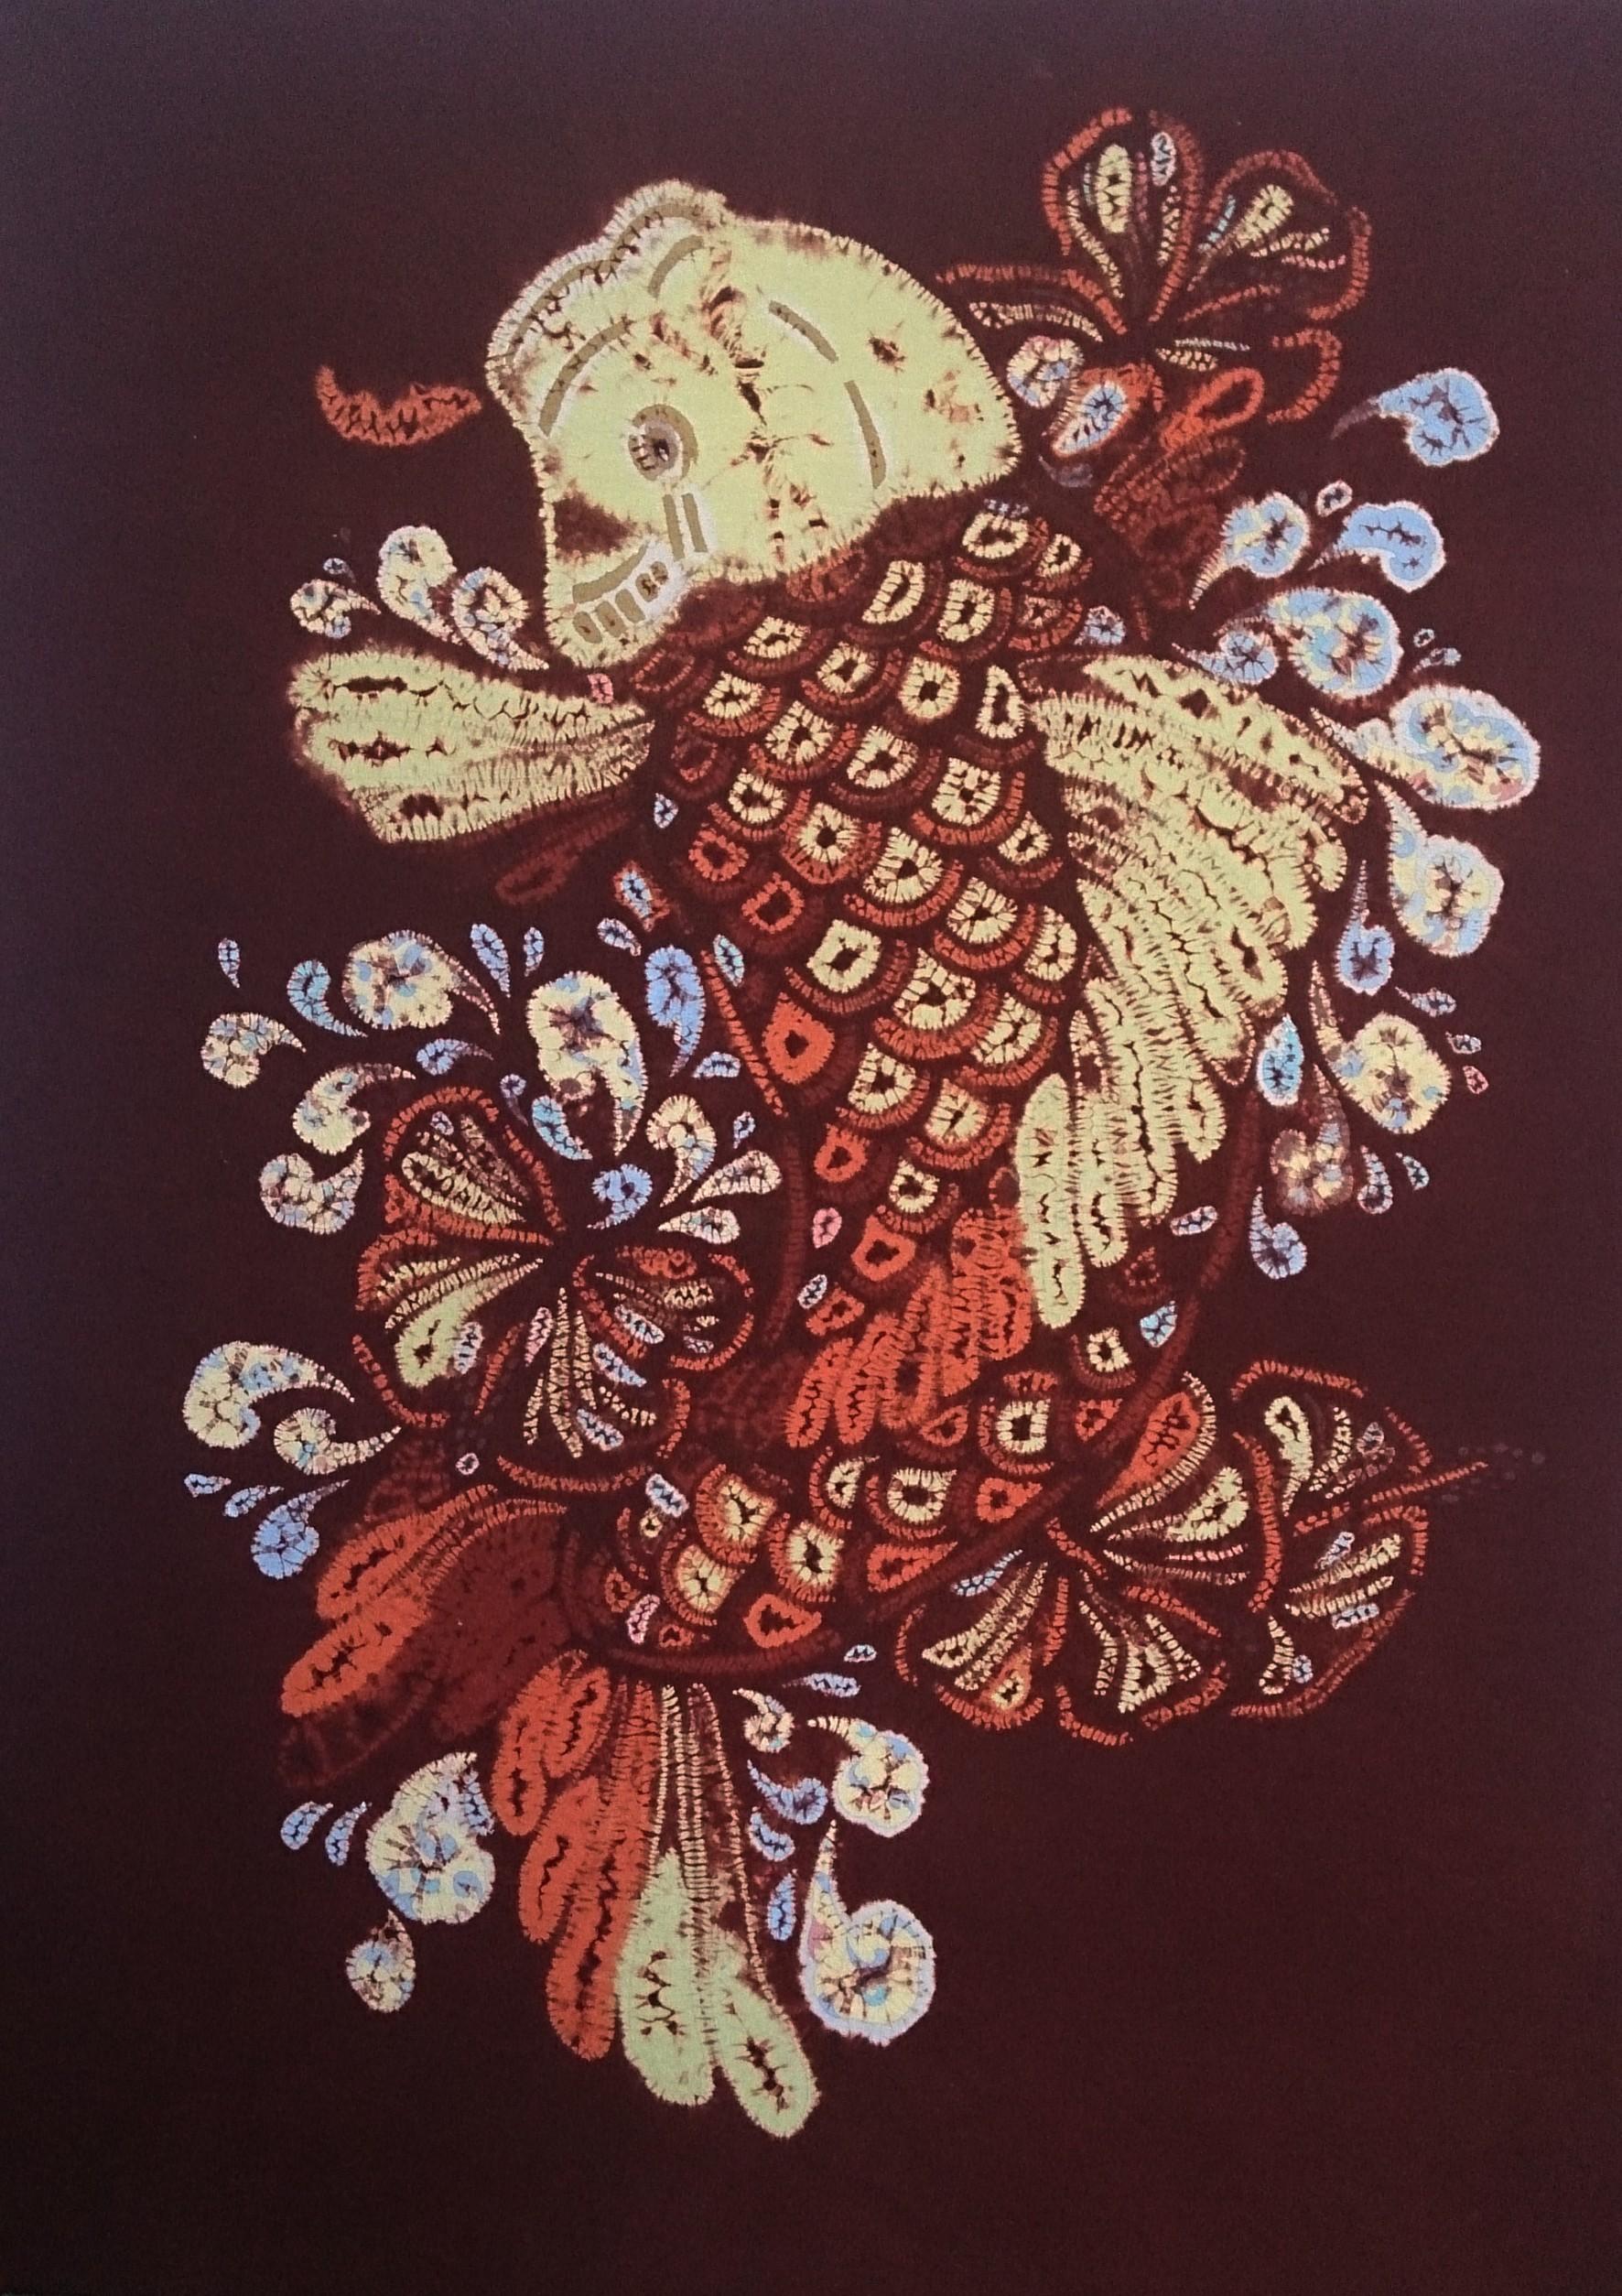 Wallpaper Gambar Ilustrasi Hewan Karya Seni Ikan Pola